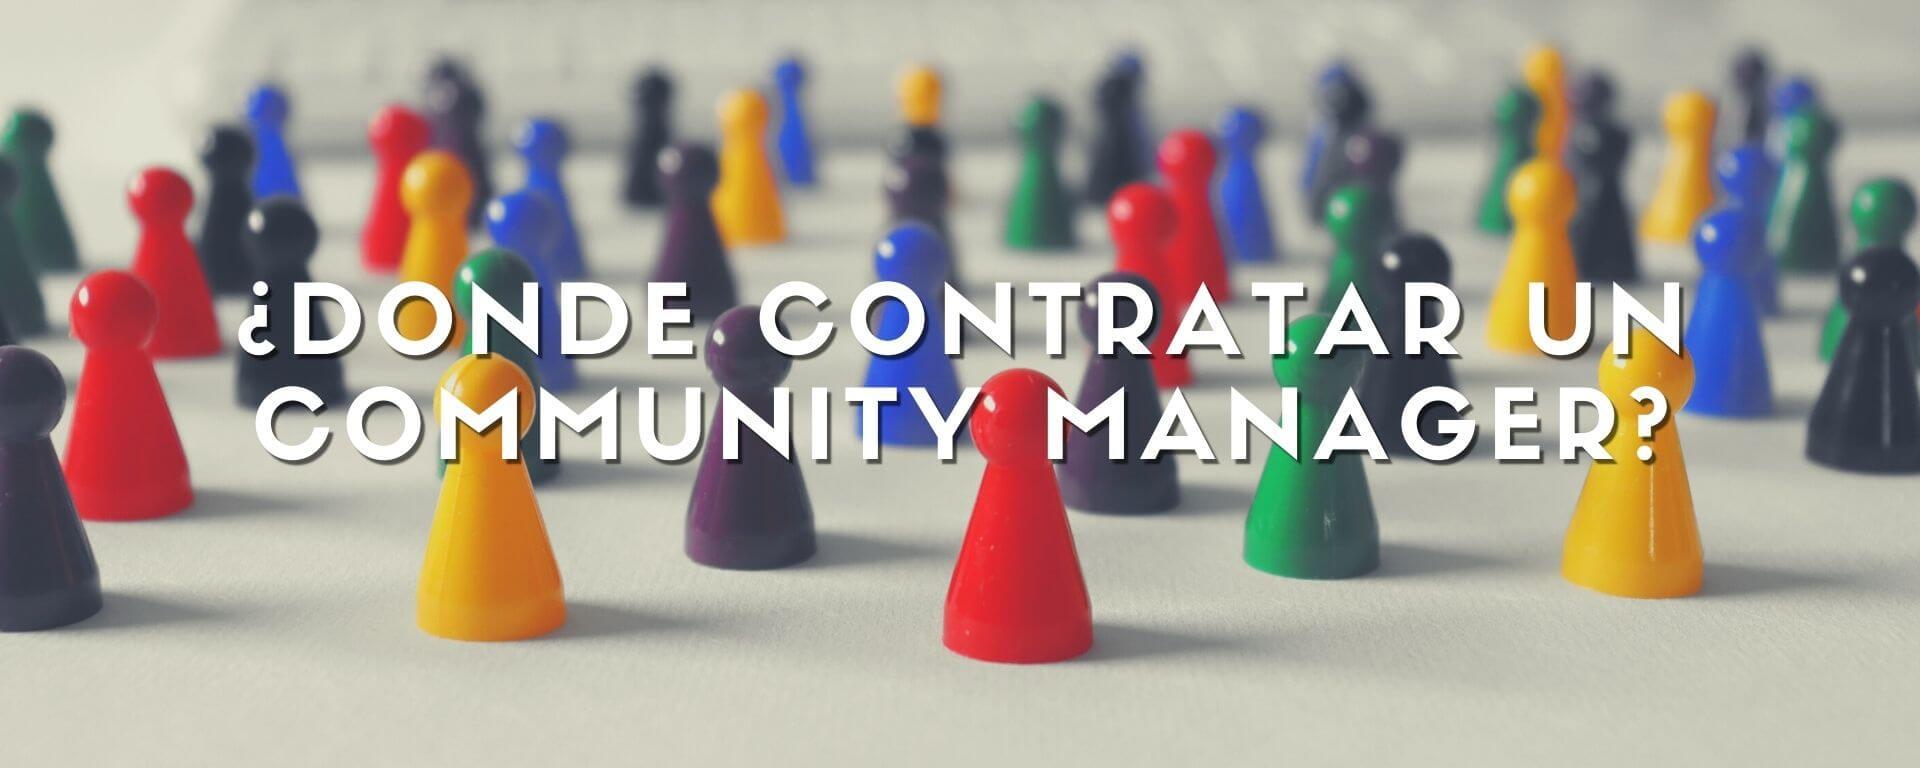 ¿Dónde contratar un Community Manager?